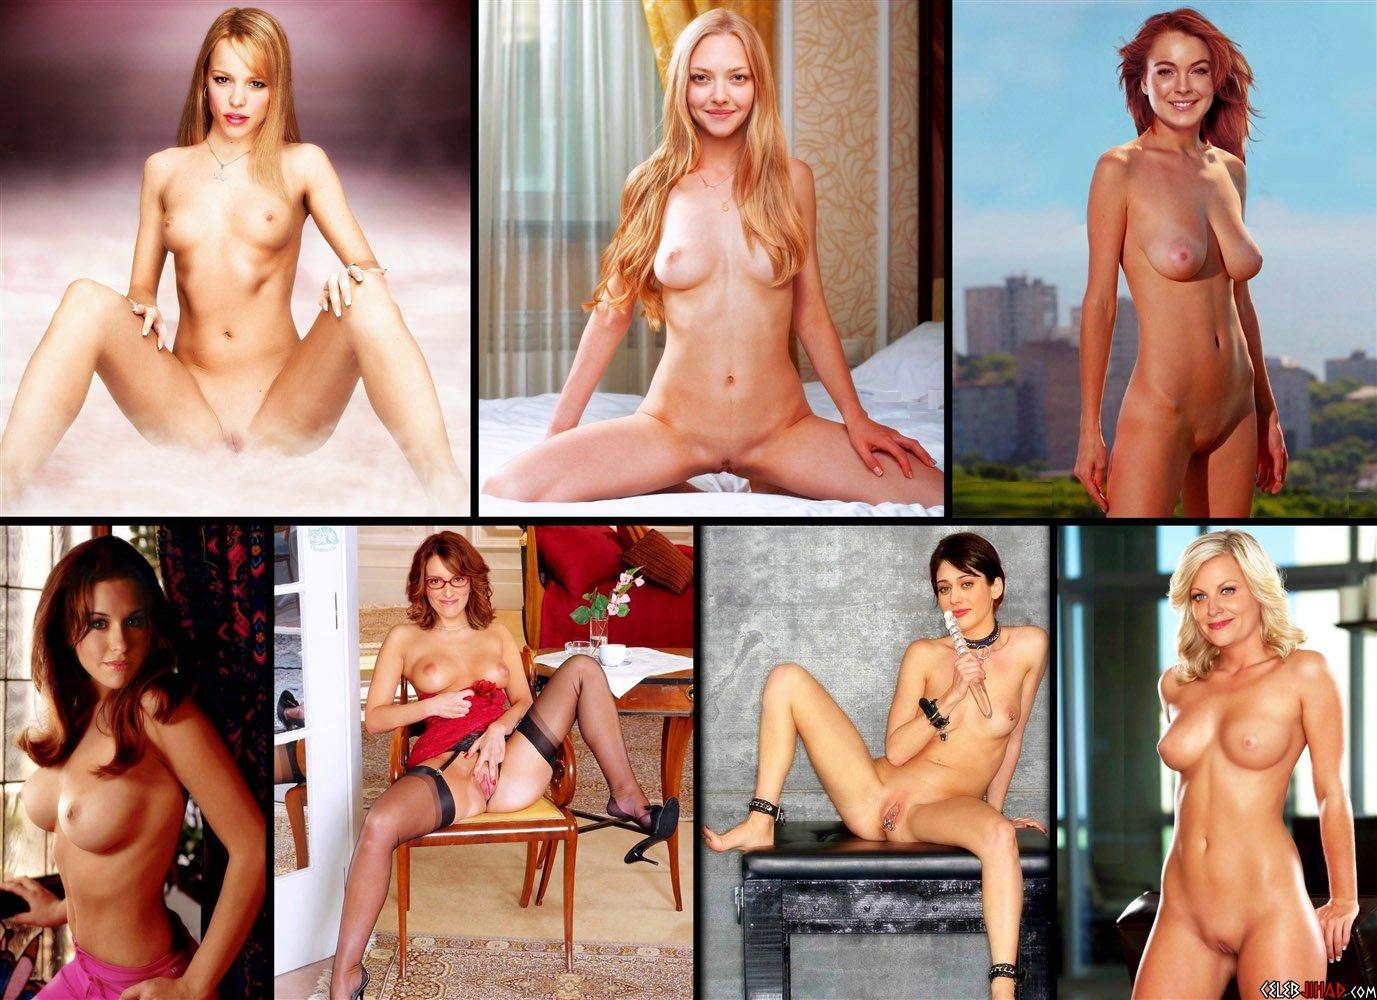 Lindsay lohan pictures on playboy men's sites online